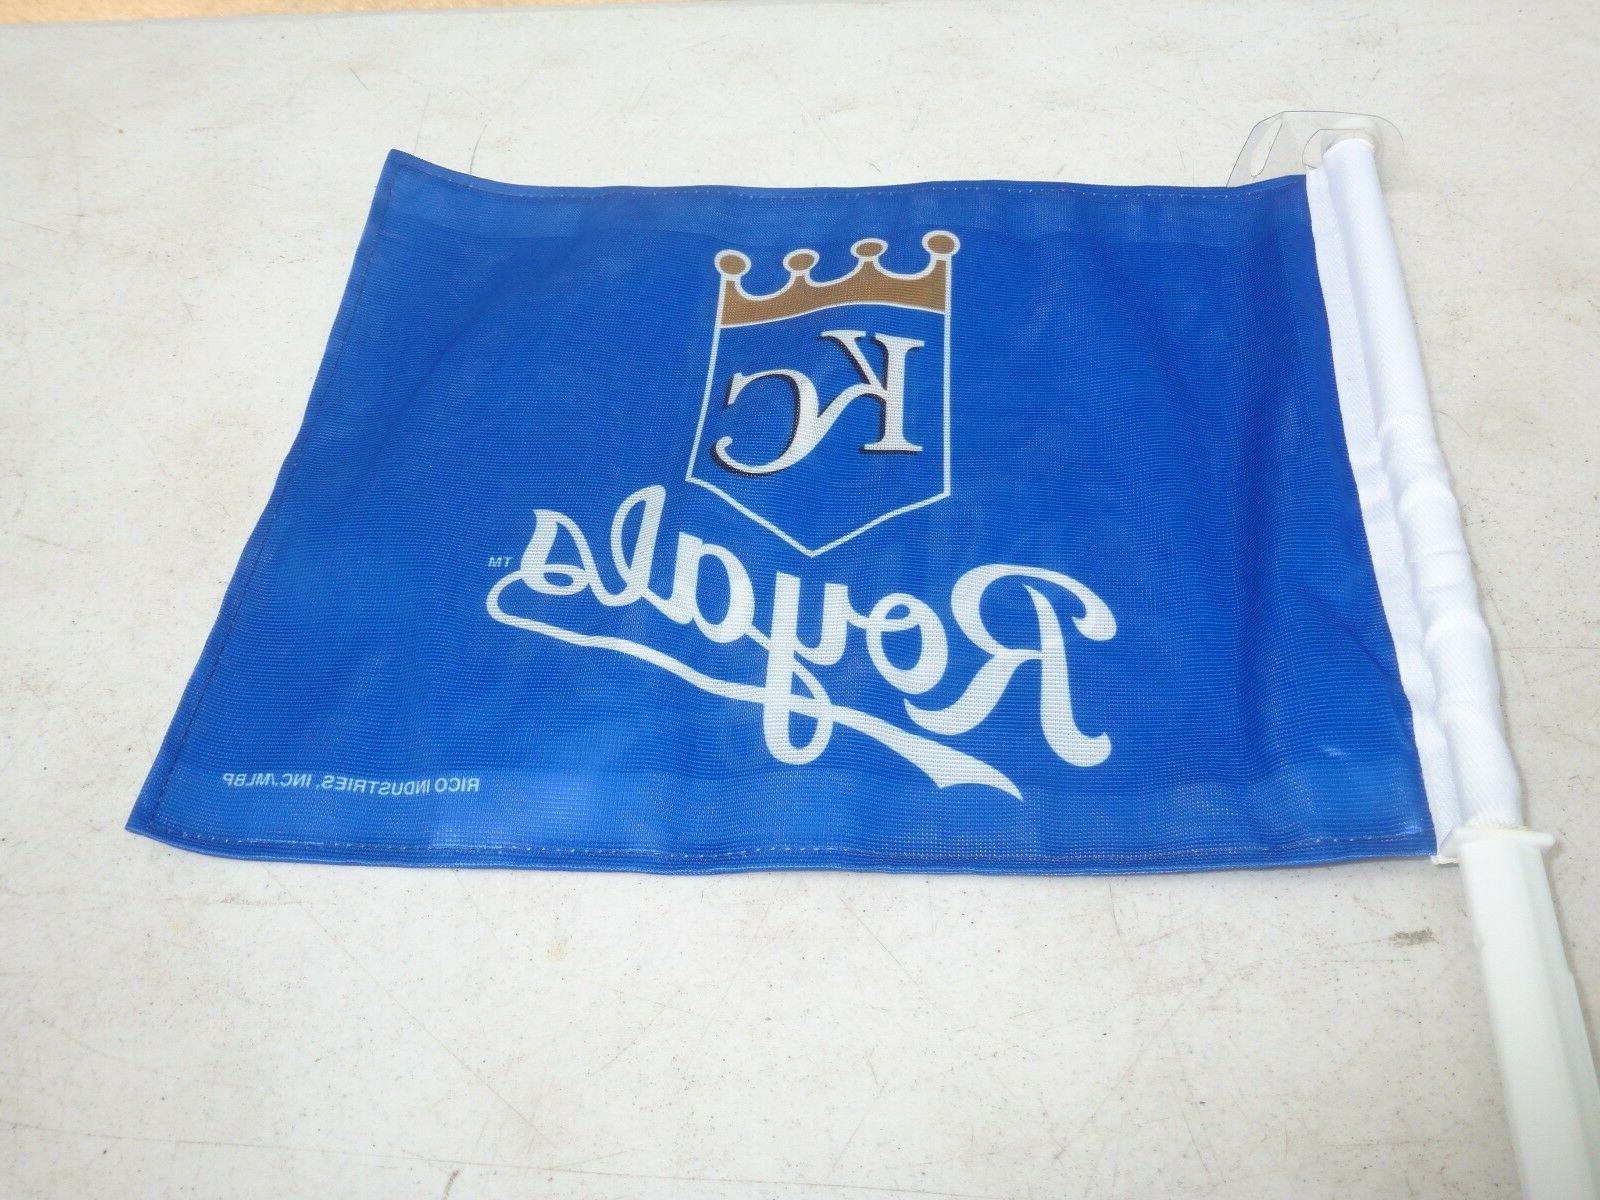 kansas city royals 14 x 11 double